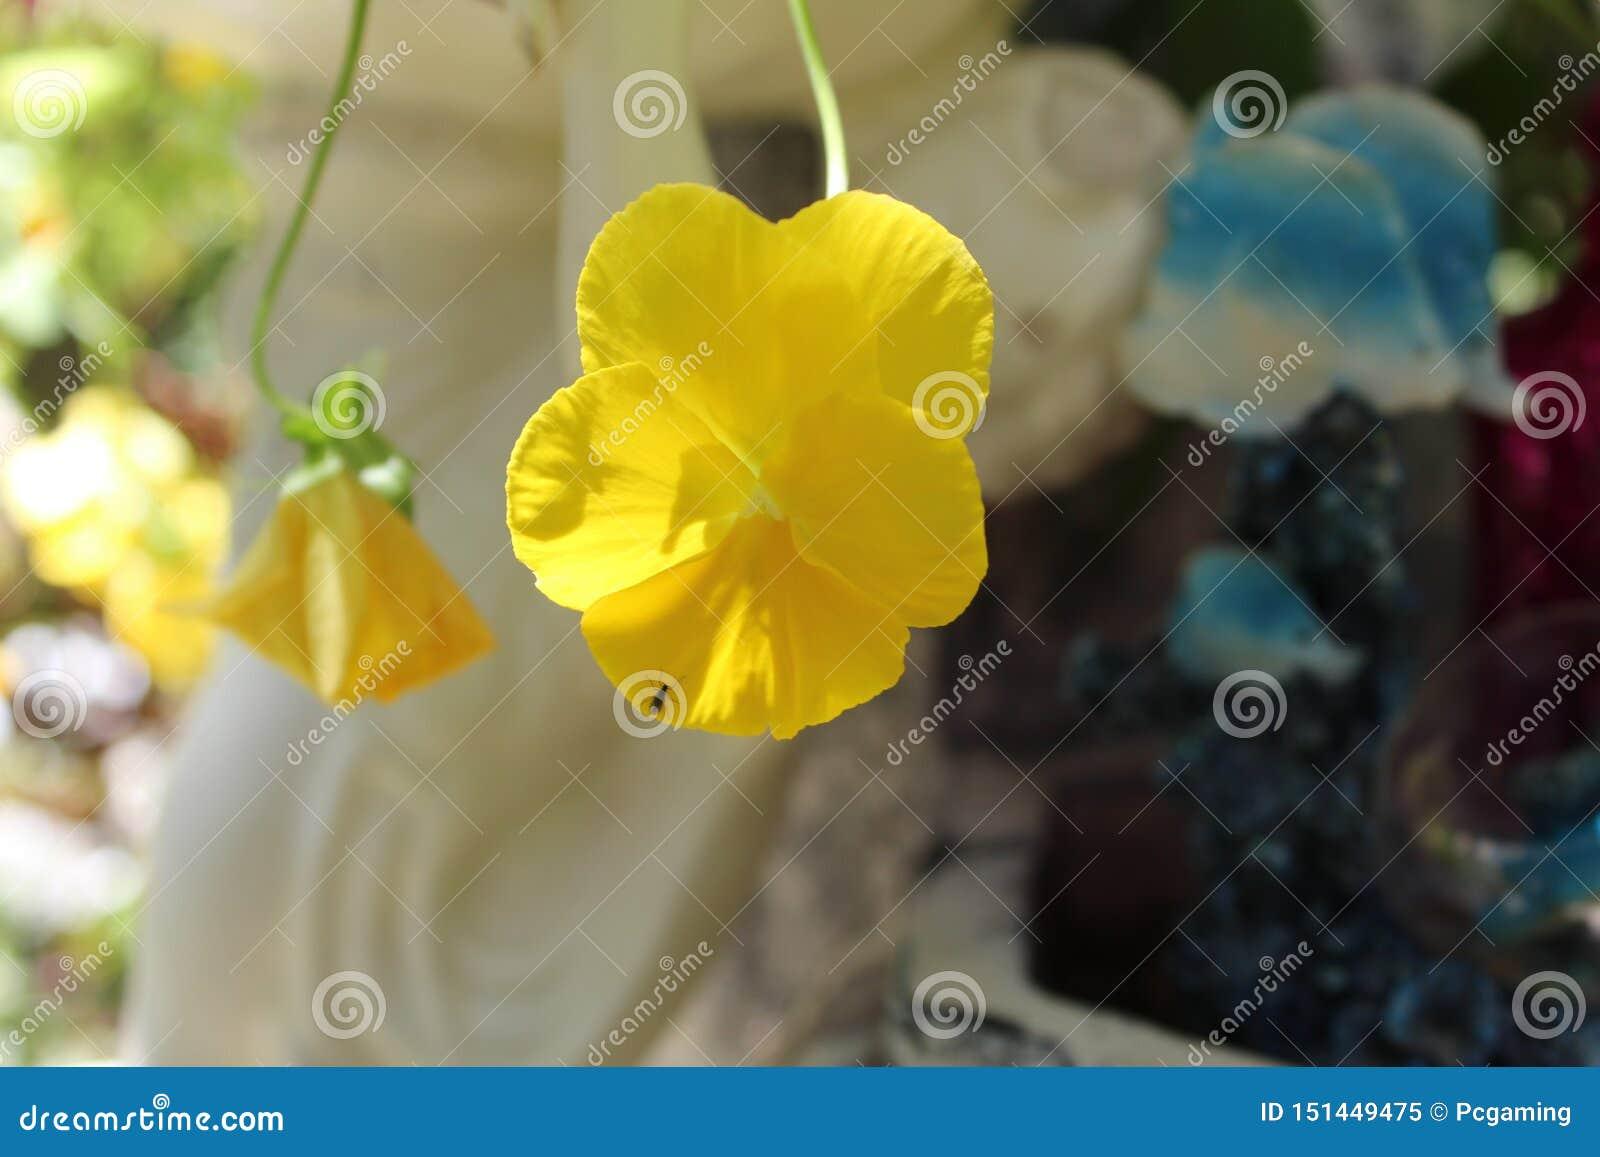 Magnoliophyta yellow